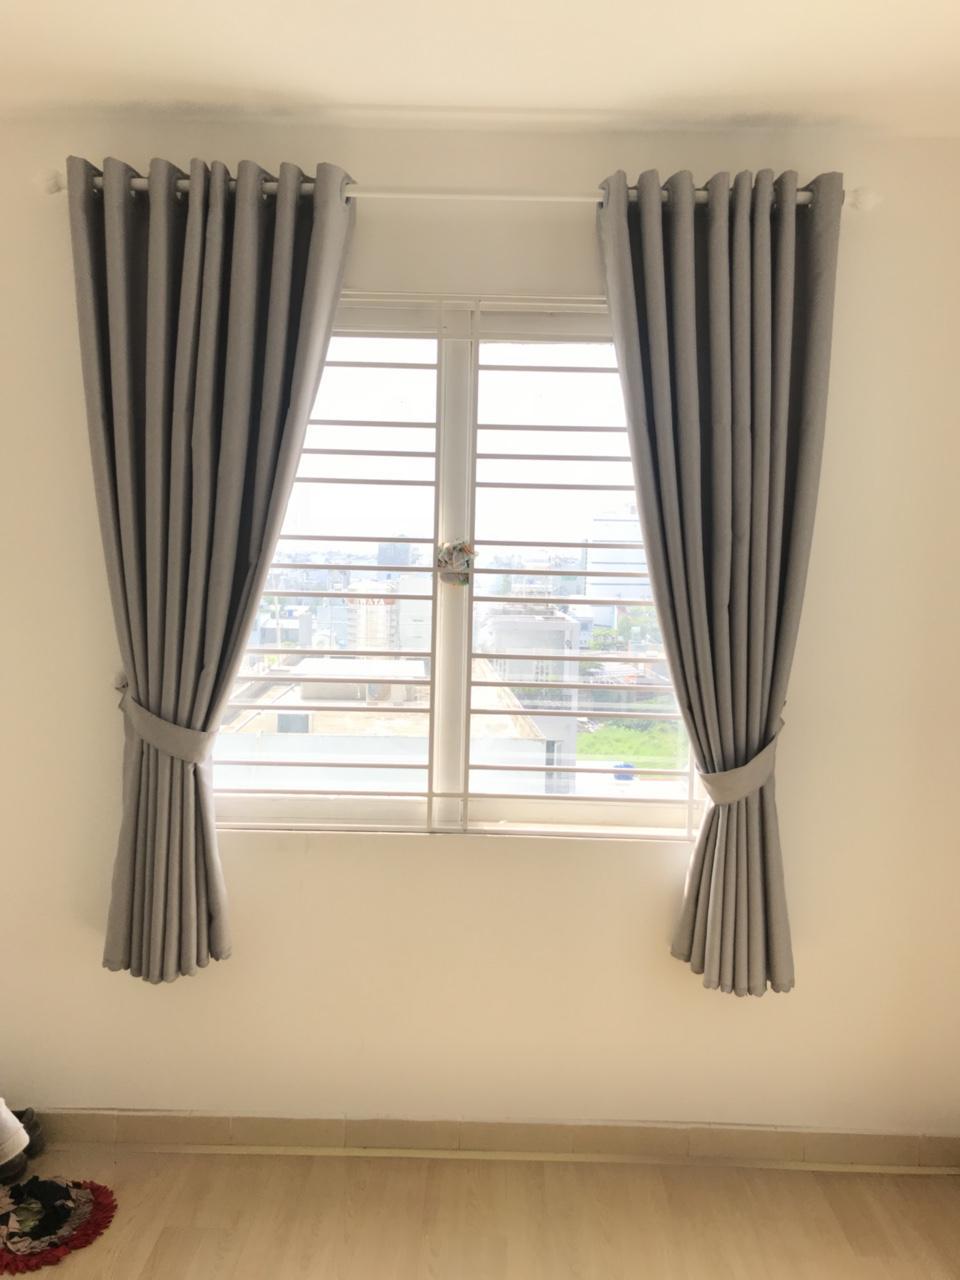 Image result for rèm cửa sổ